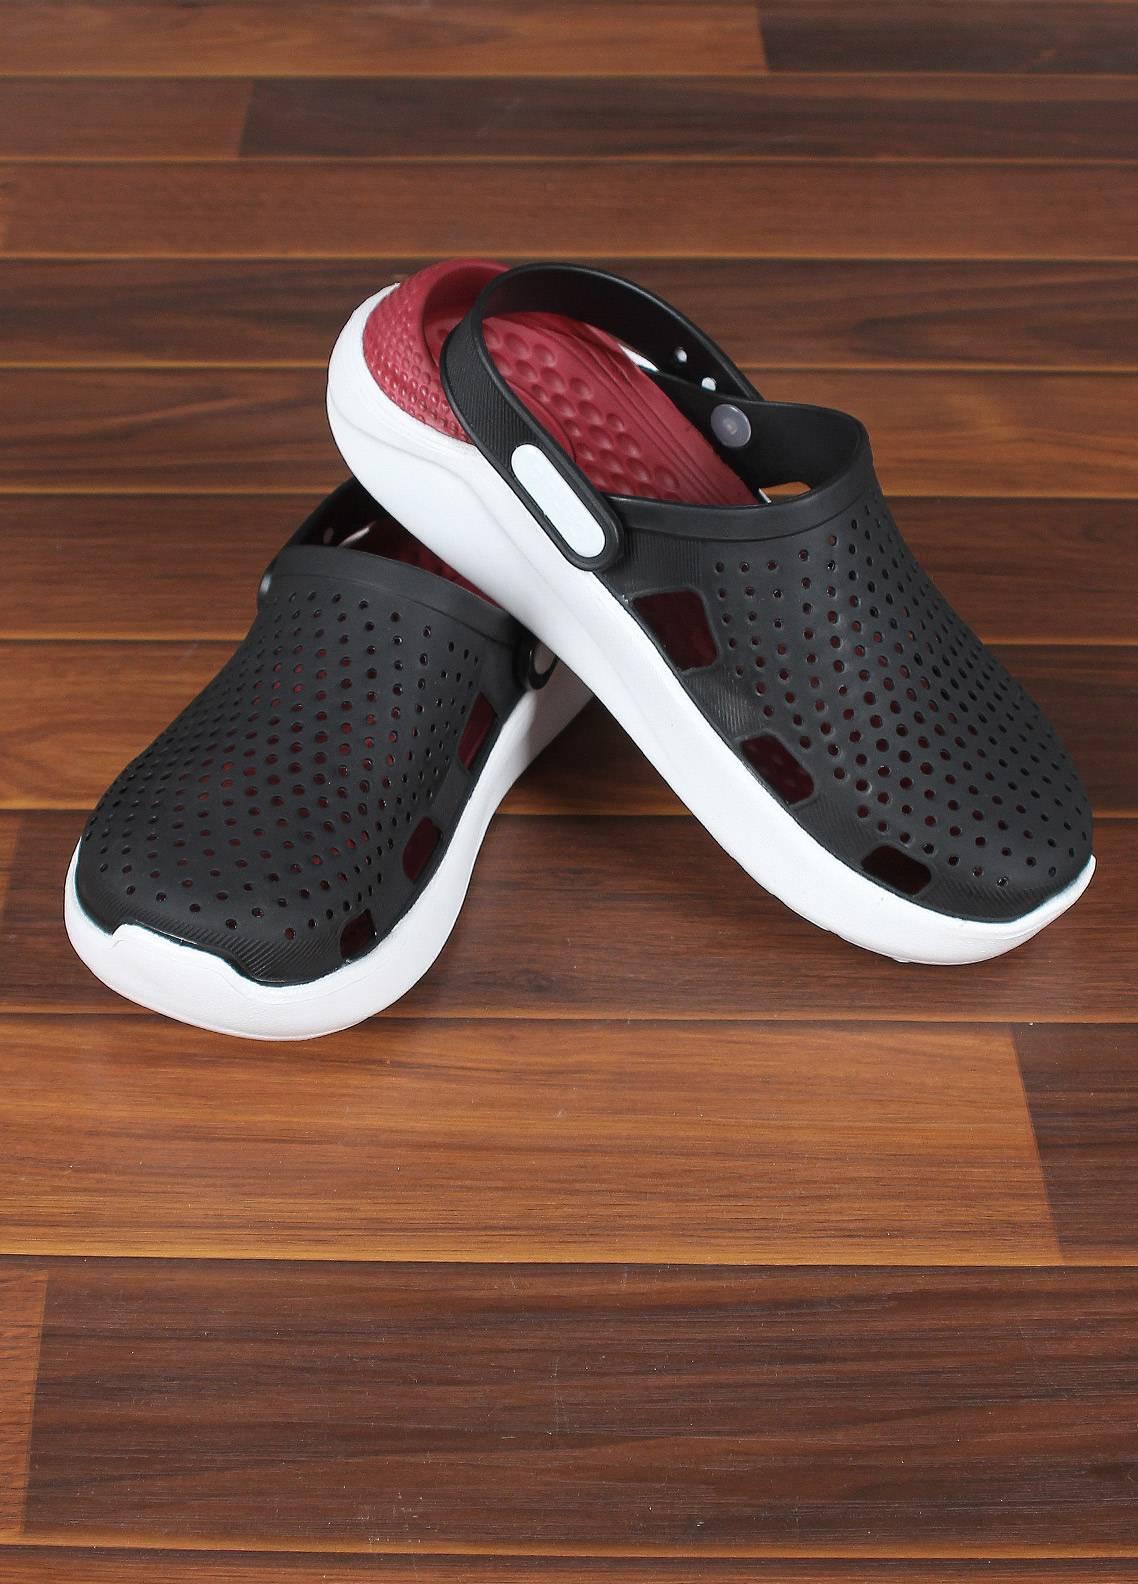 Sanaulla Exclusive Range  Rubber Slippers For Men 806 Black